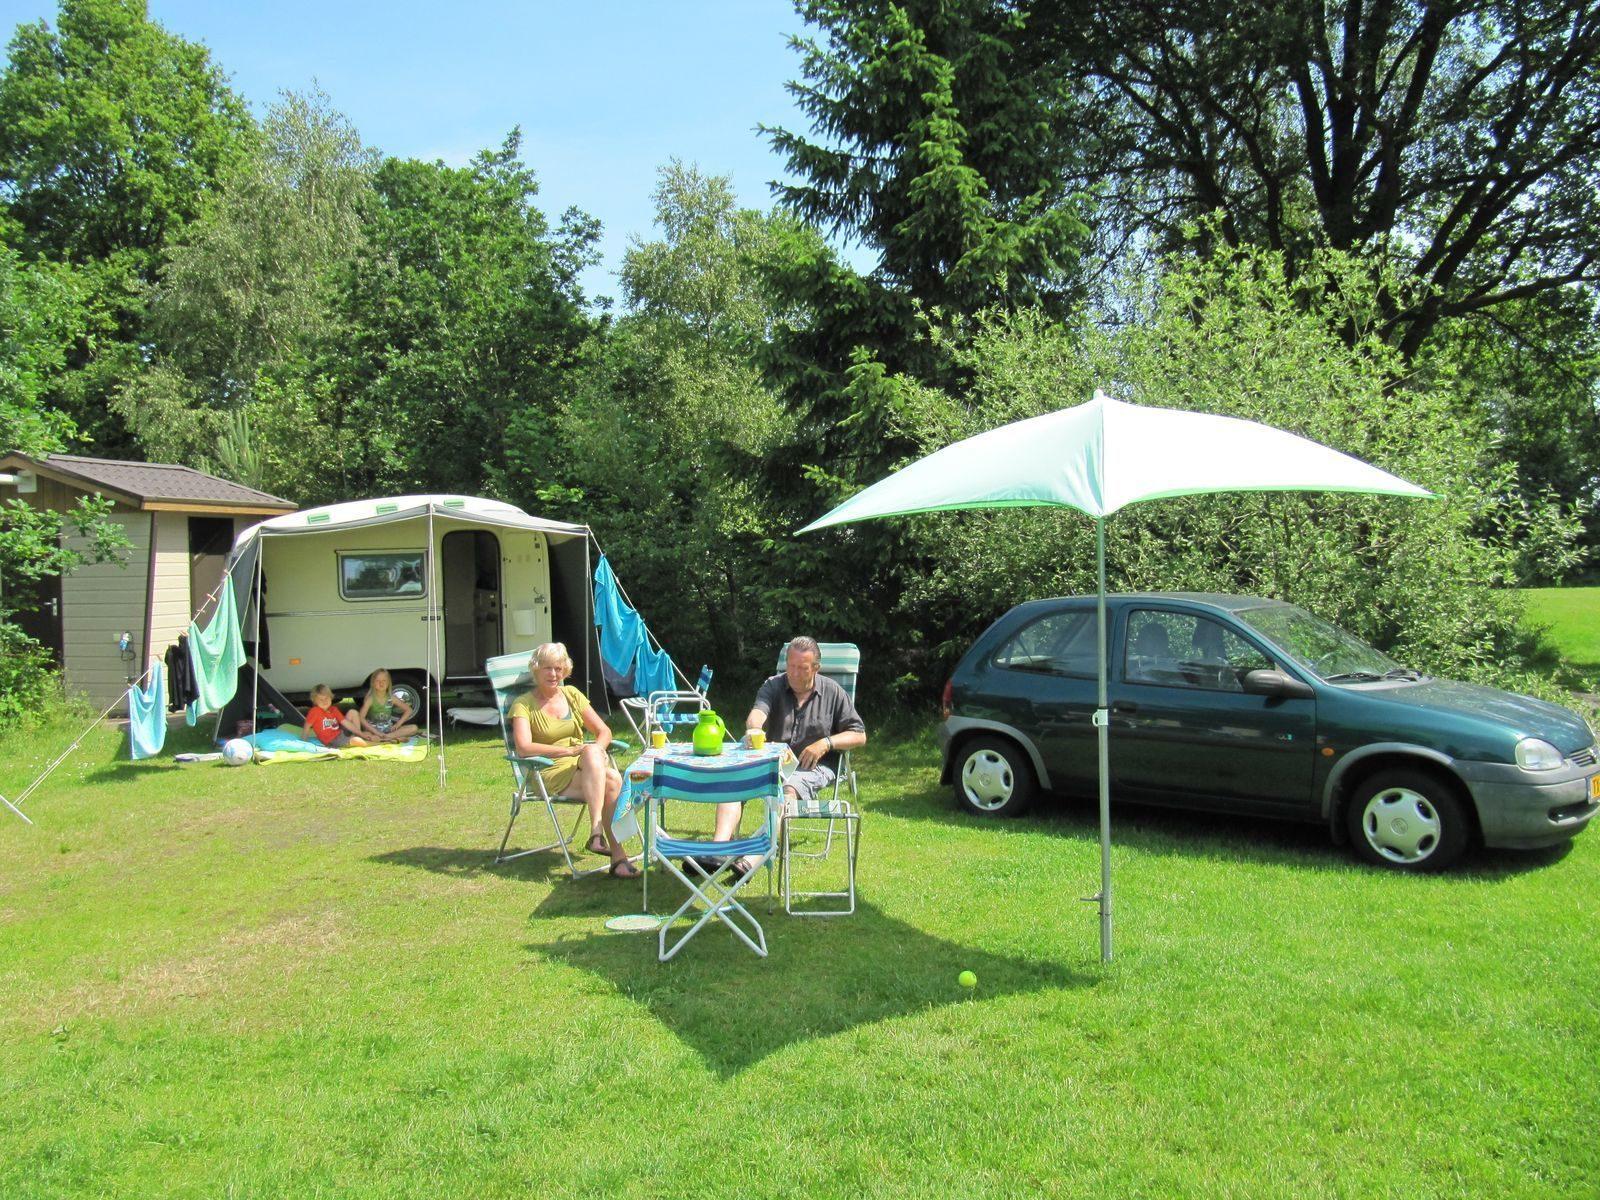 Camping 50 plus Drenthe